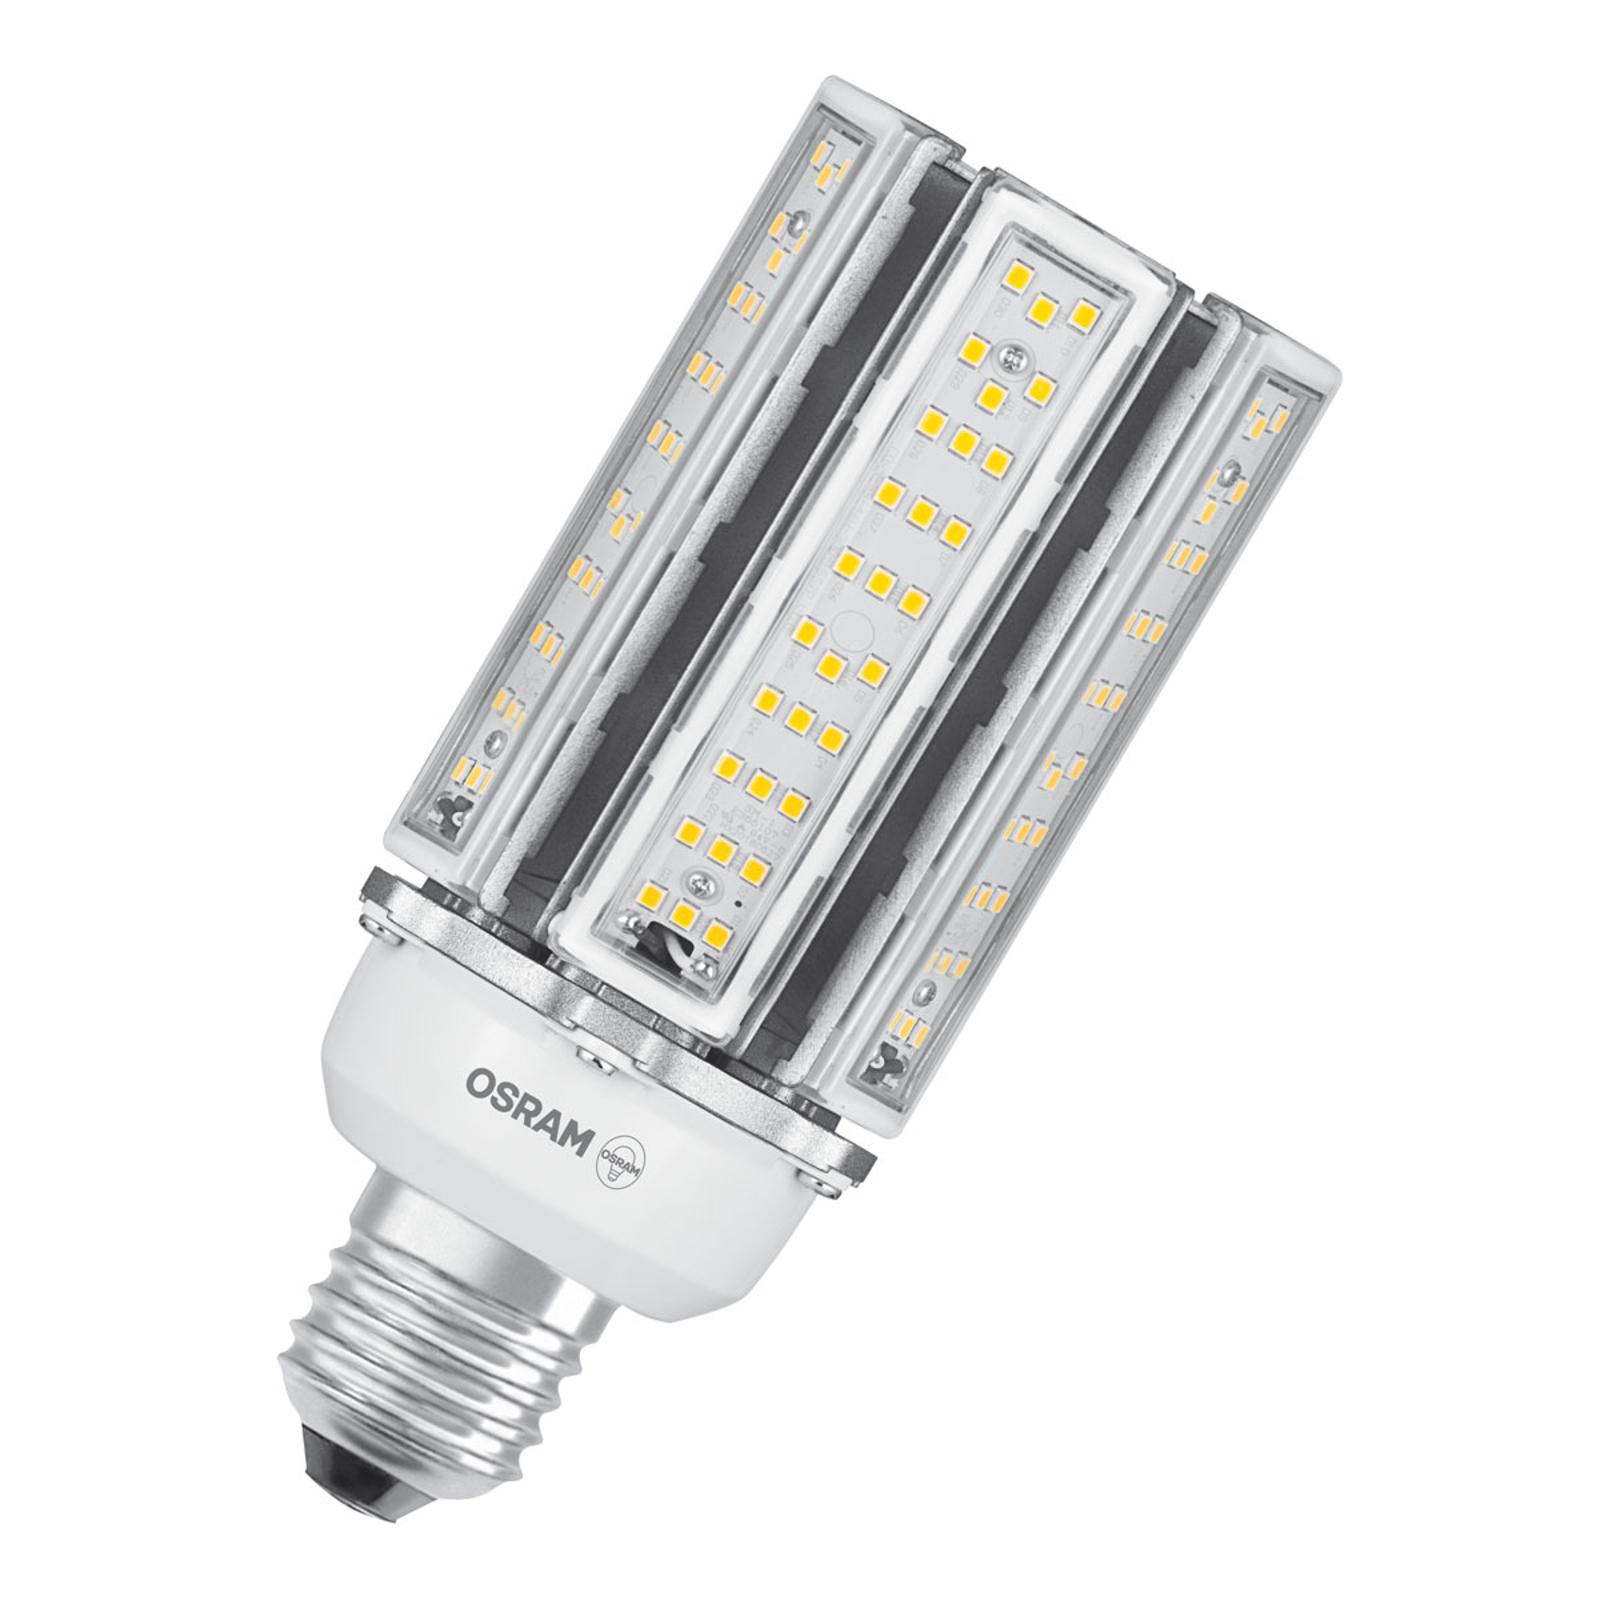 OSRAM LED-pære E40 Parathom HQL 46 W 2°700 K